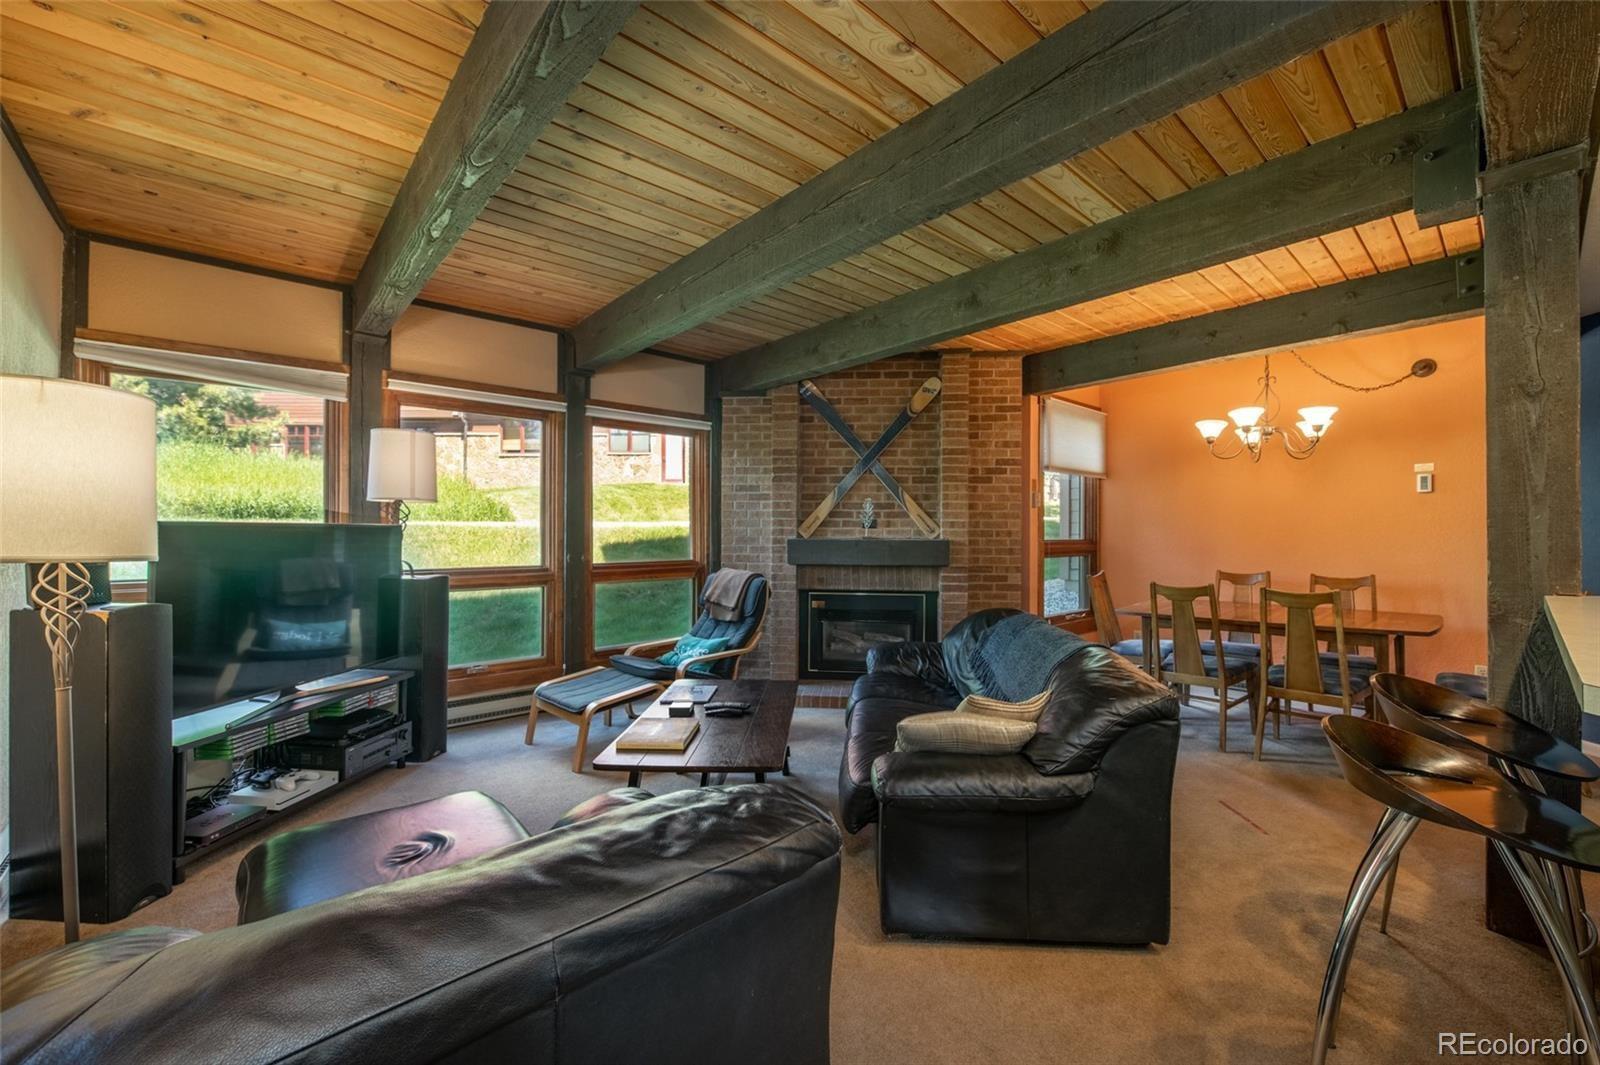 MLS# 6498865 - 1 - 2700 Village Drive #105, Steamboat Springs, CO 80487